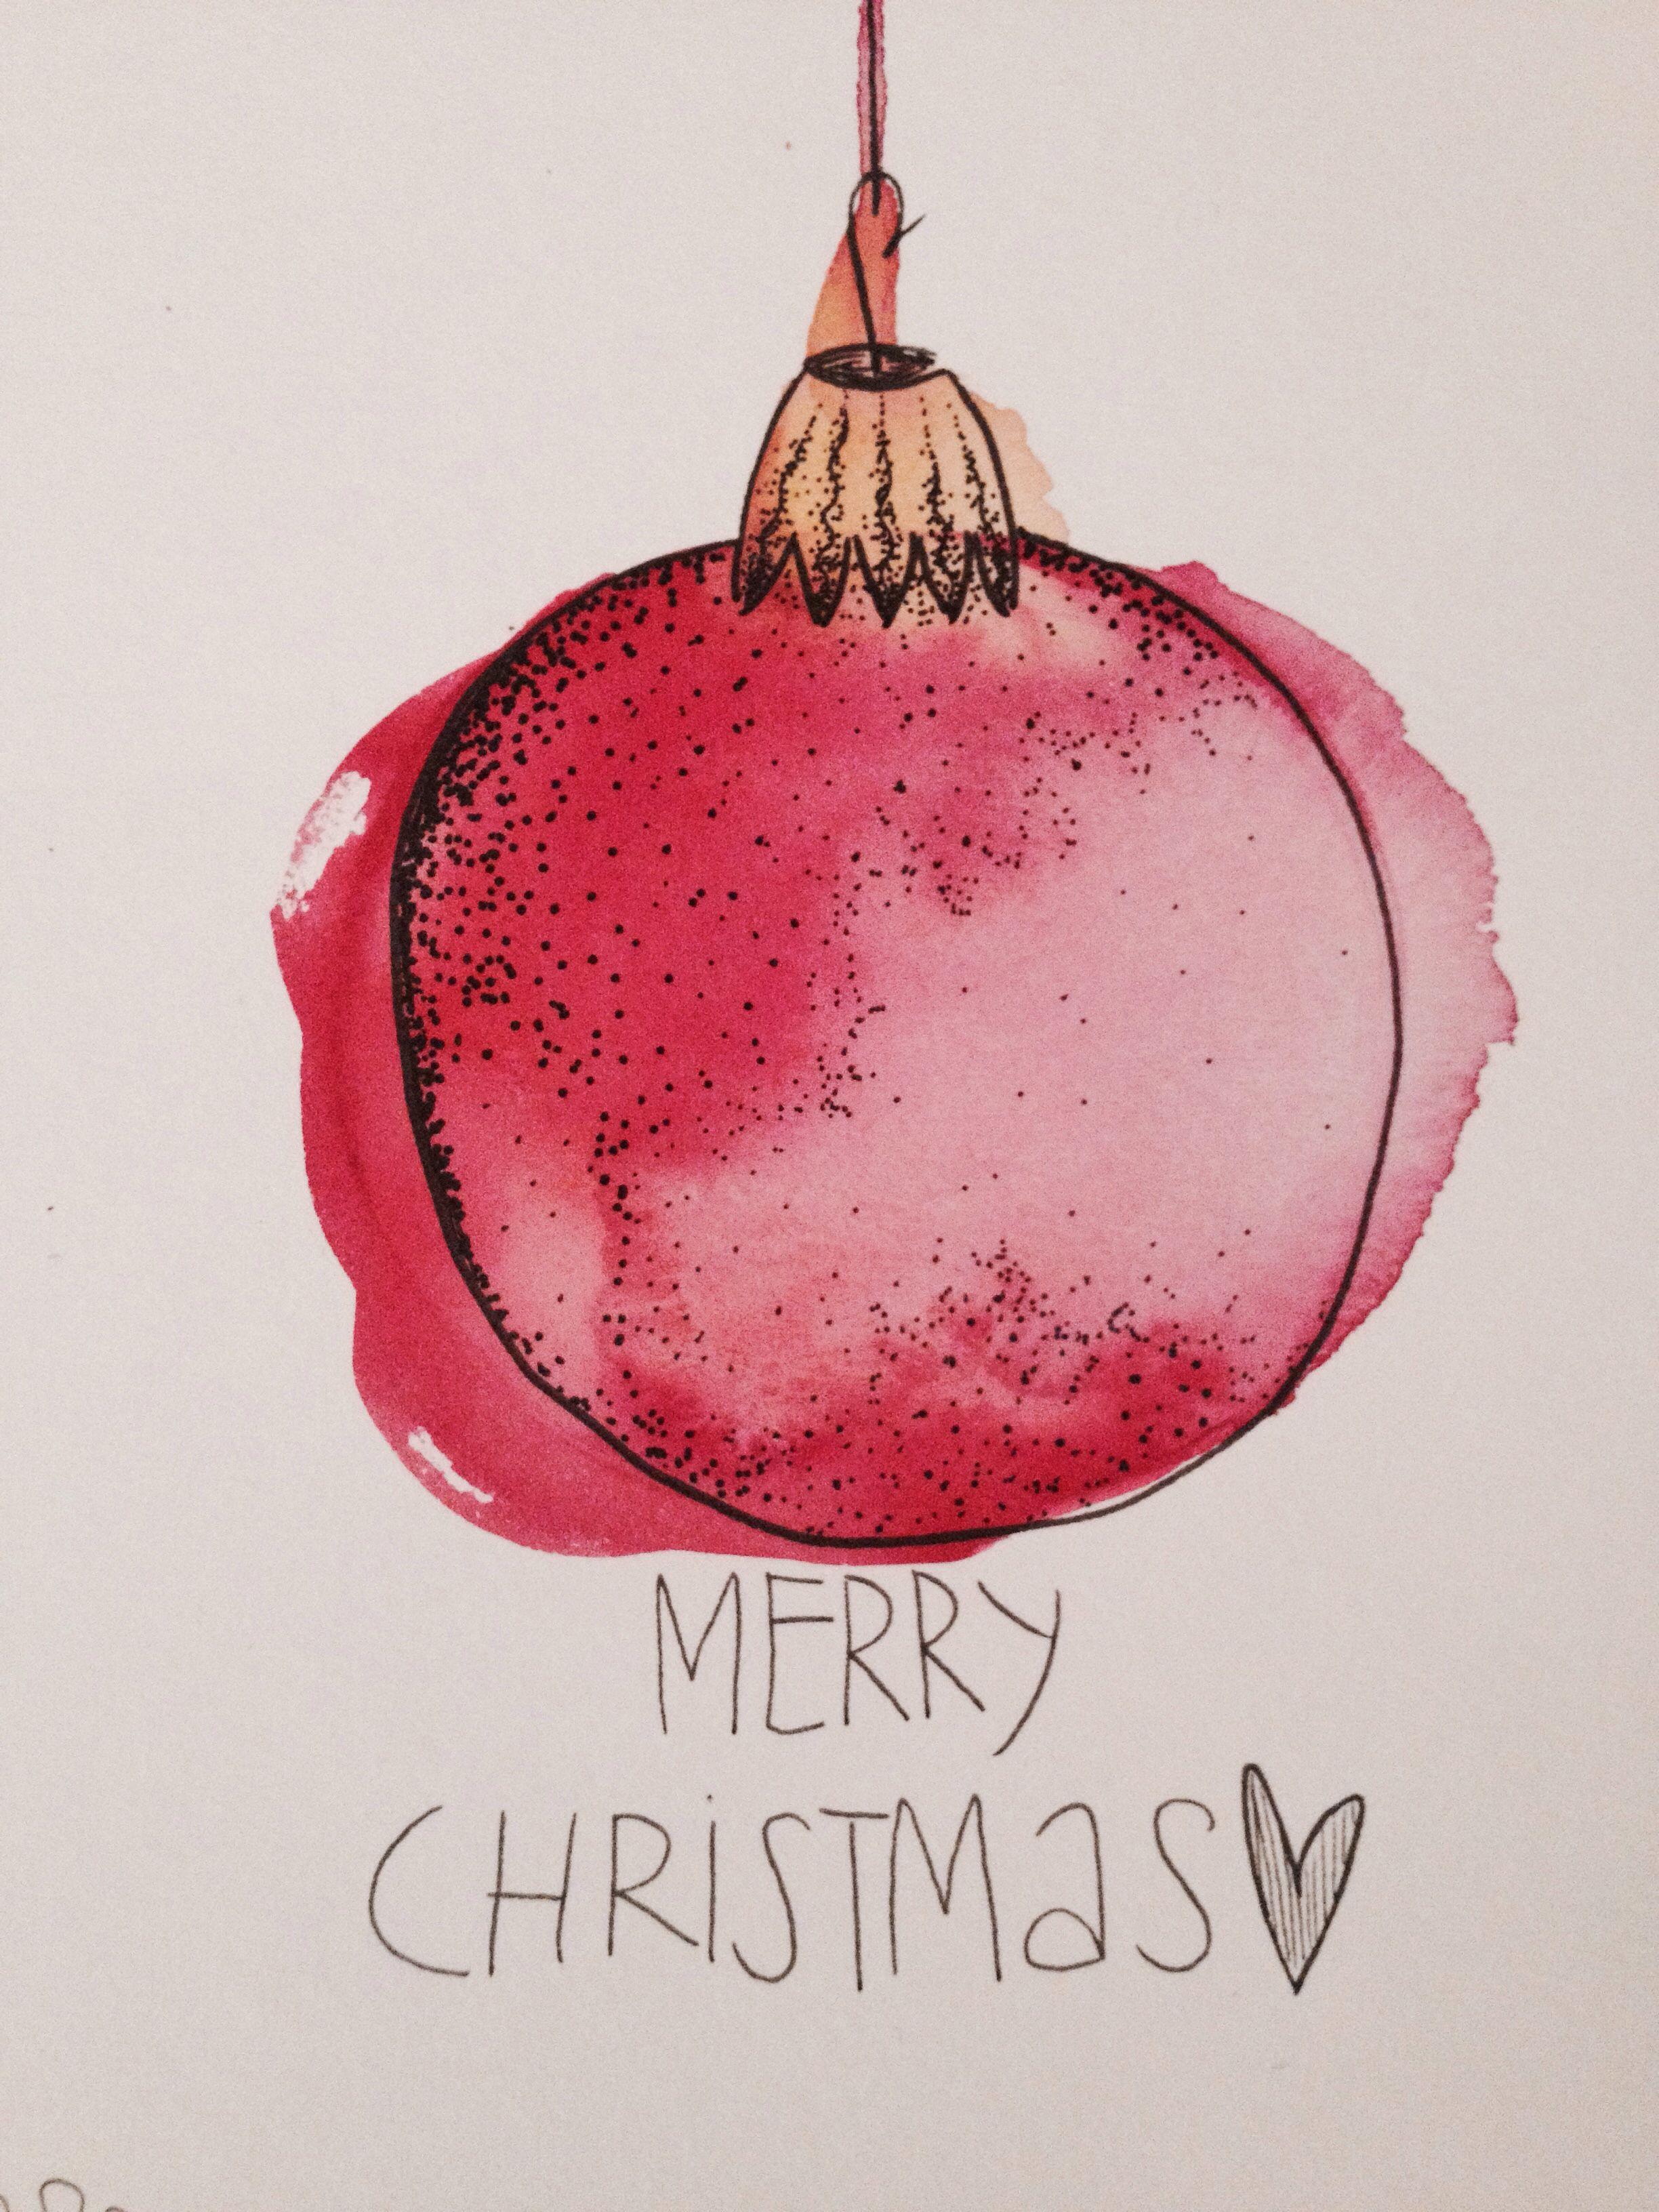 aquarell weihnachtskarte aquarell weihnachten. Black Bedroom Furniture Sets. Home Design Ideas